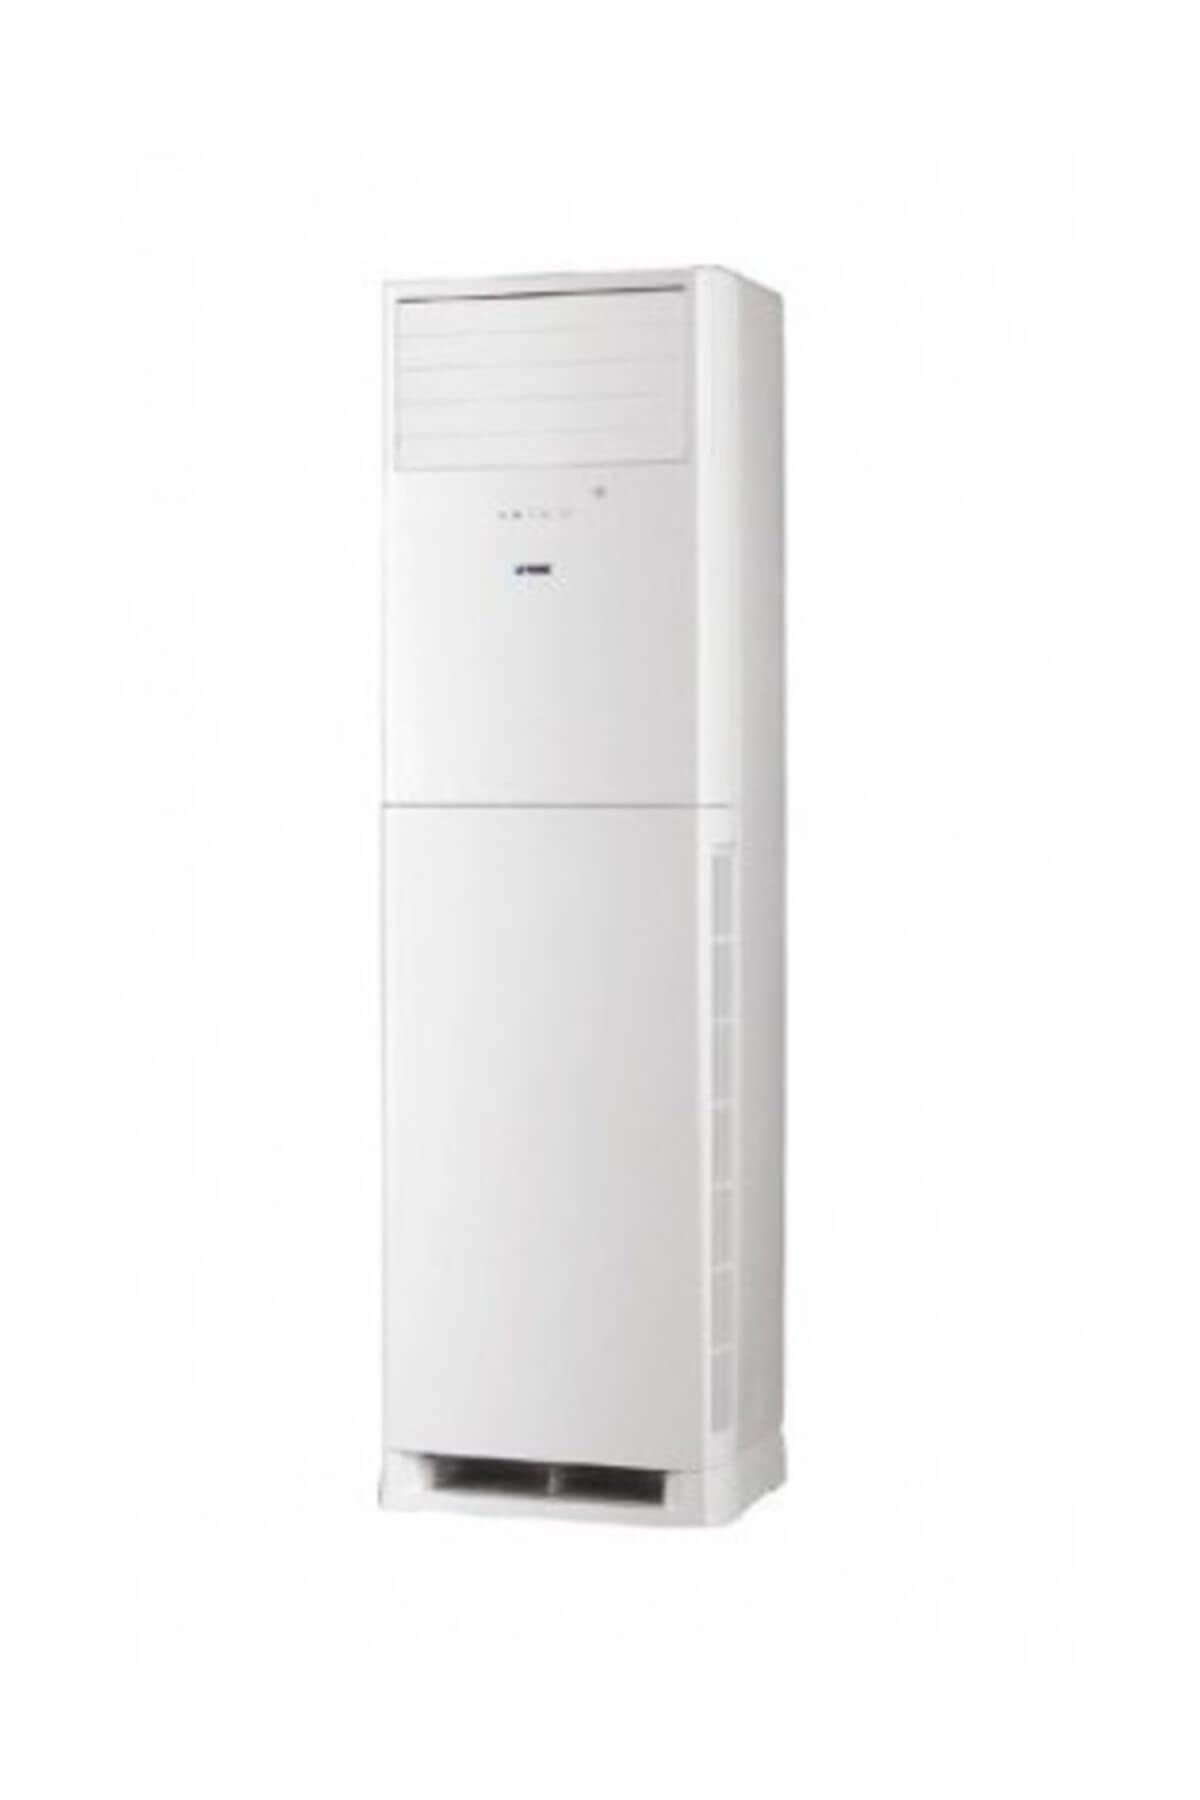 YORK İnverter Salon Tipi Klima 48.000 BTU/h (220 V) - 1555